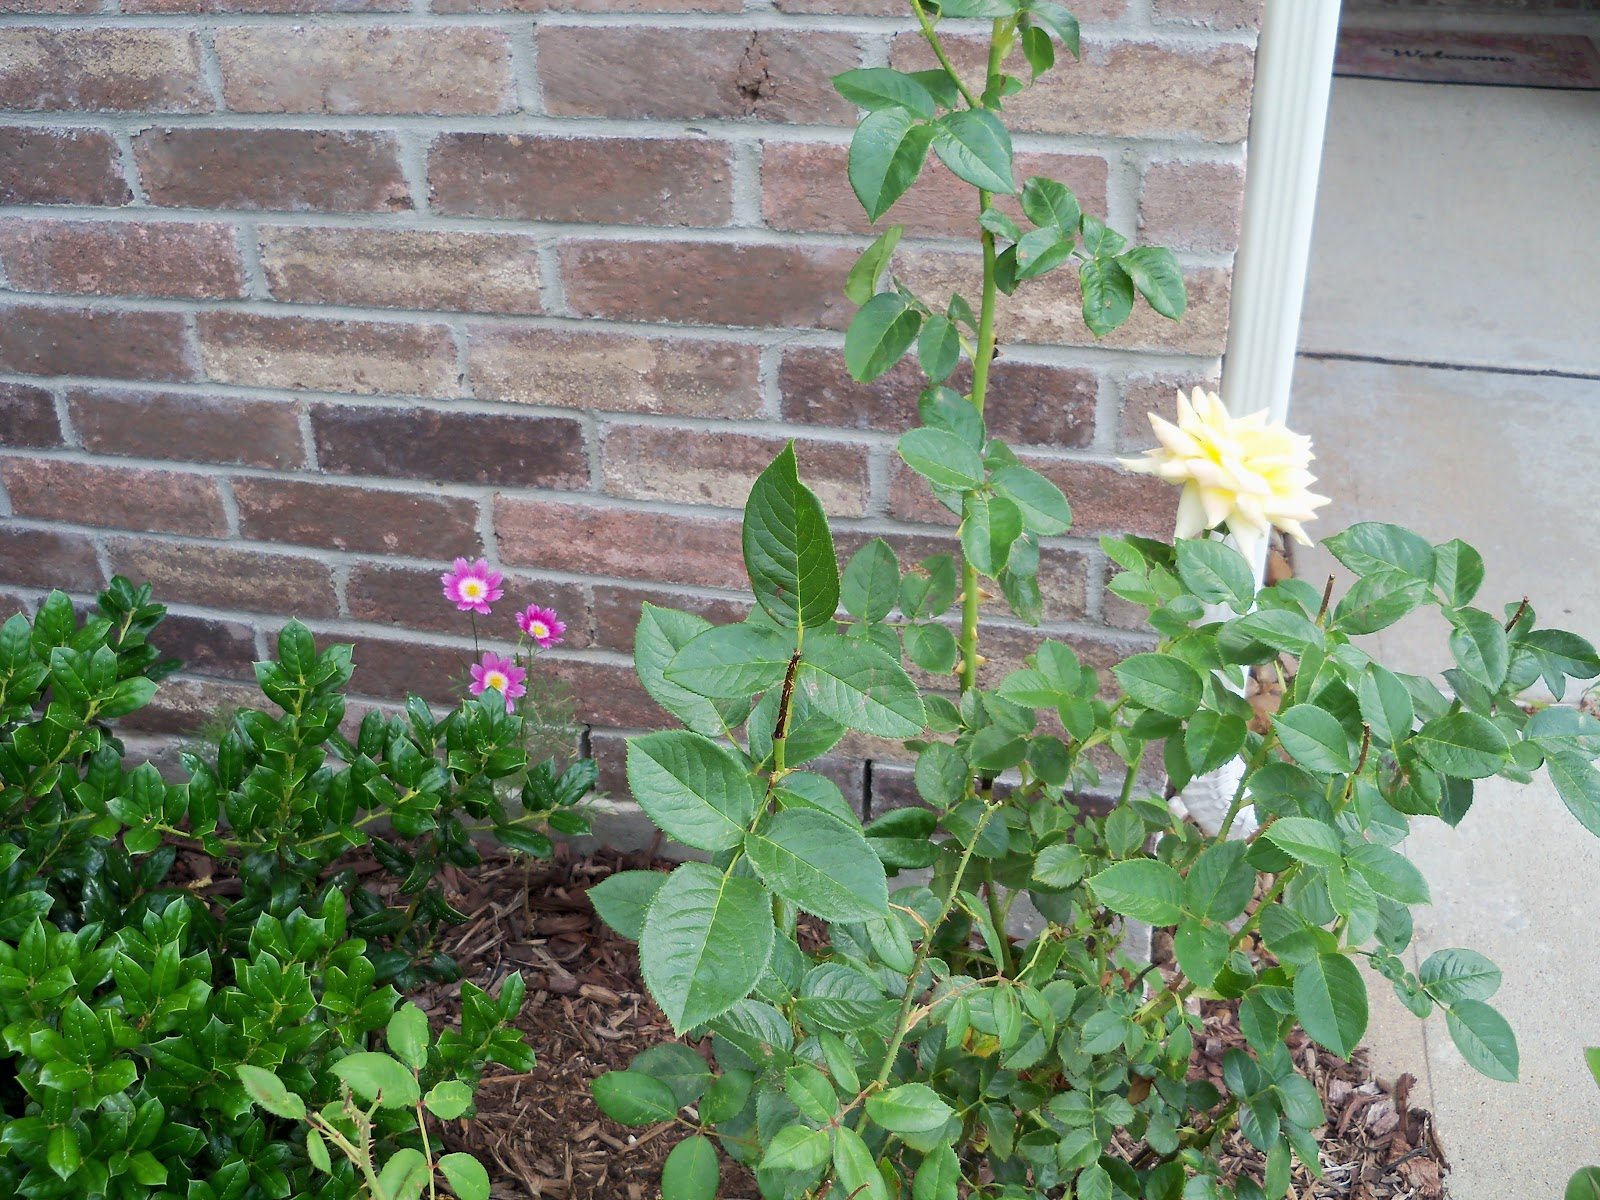 Gardening 2010, Part Two - 101_2844.JPG